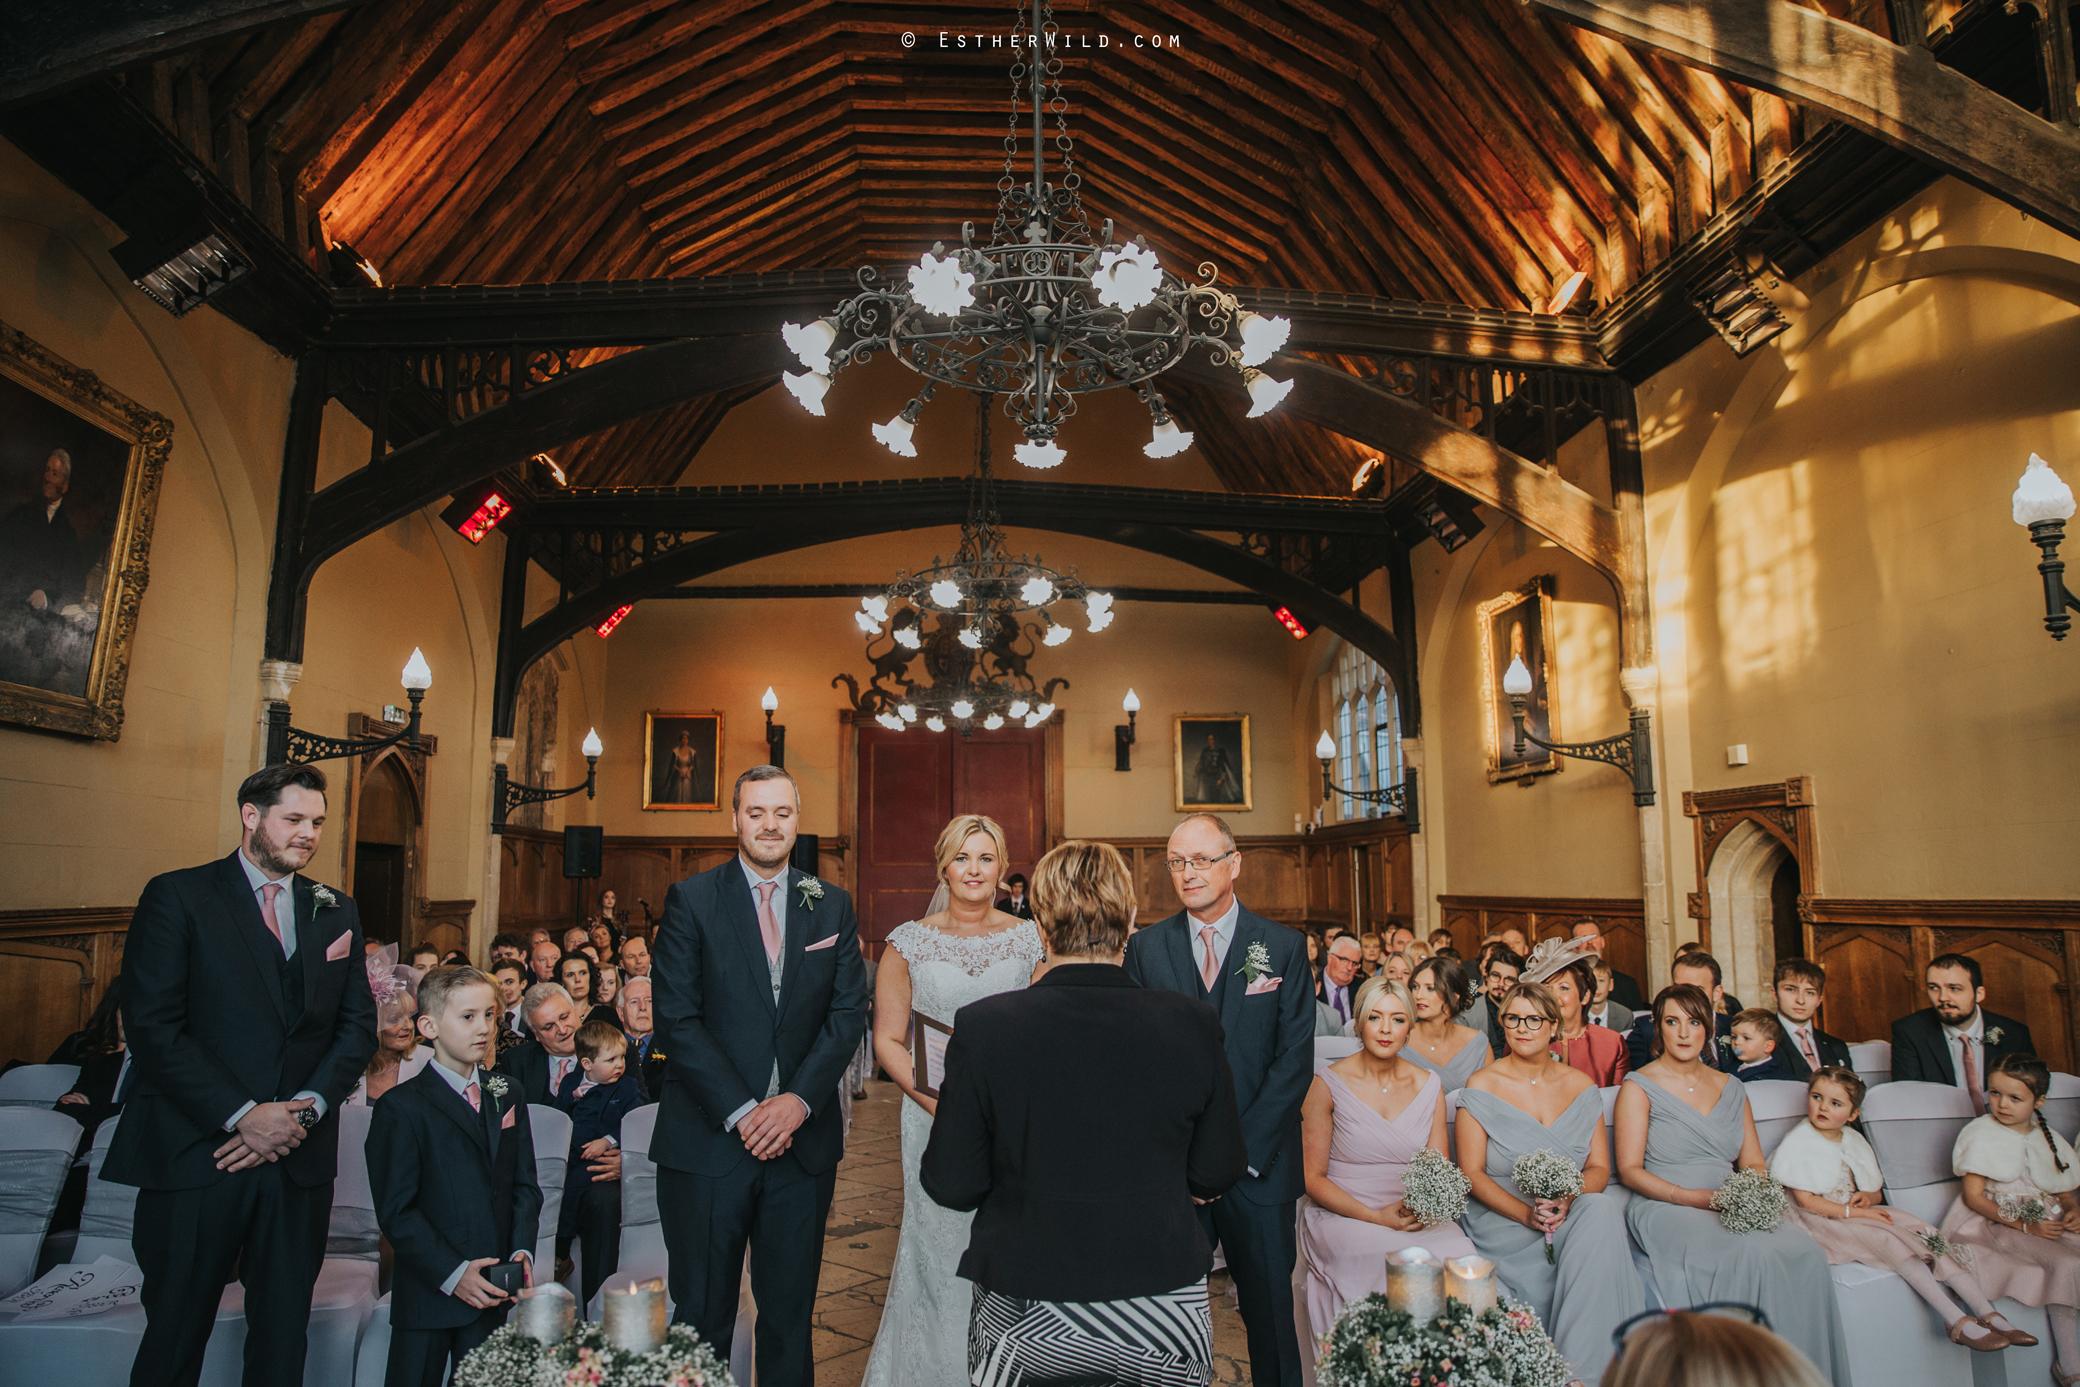 Wedding_Kings_Lynn_Town_Hall_Norfolk_Photographer_Esther_Wild_IMG_0944.jpg